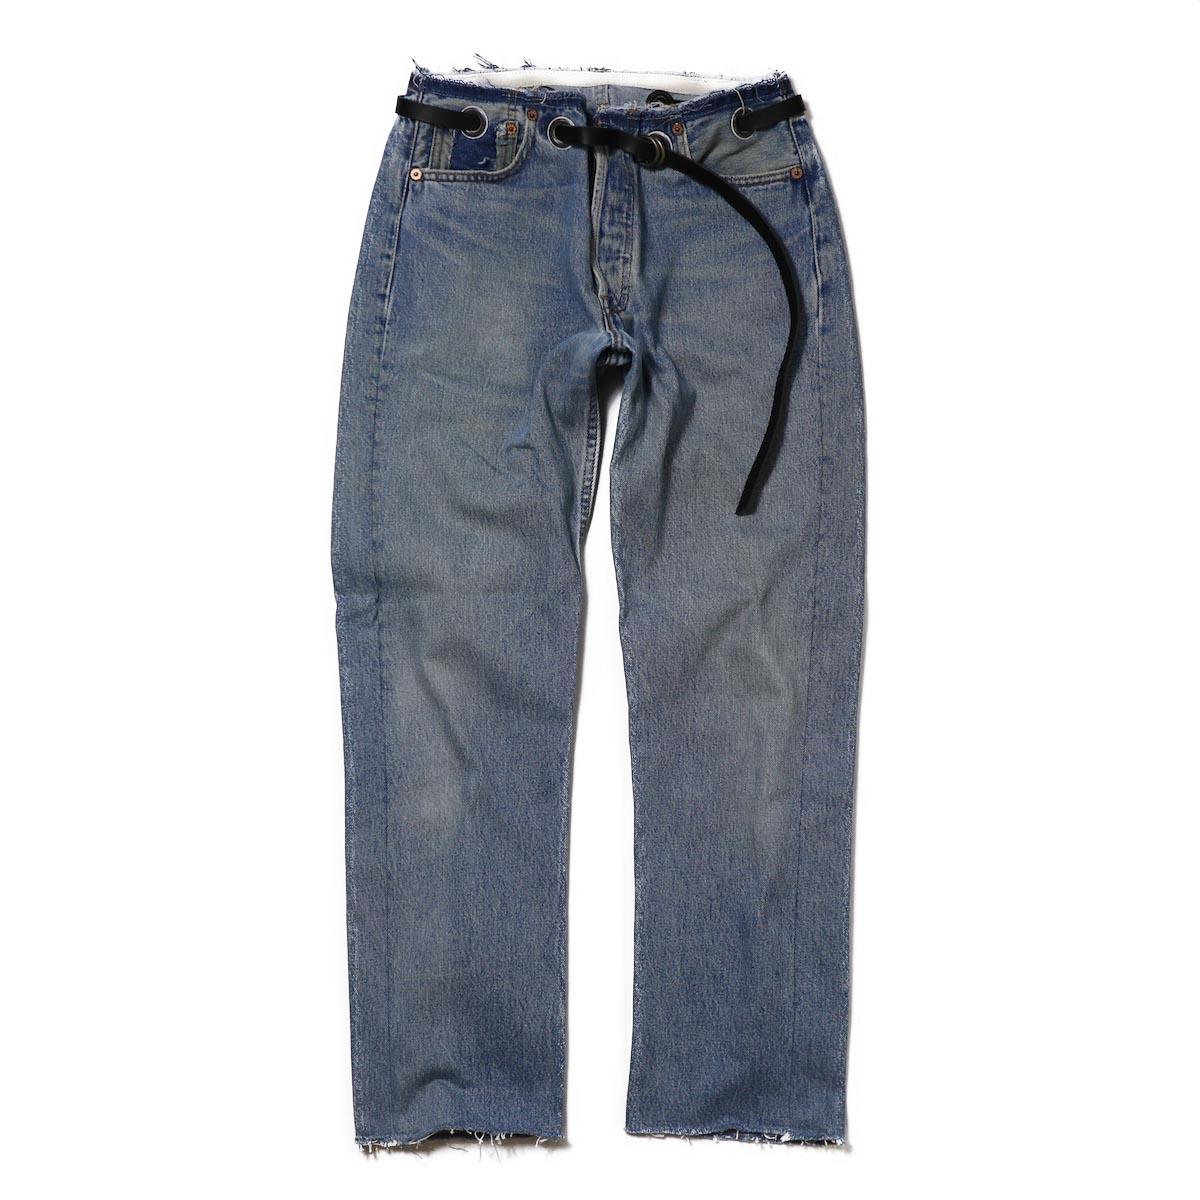 BONUM / SLIM BELTED 5PK -BLUE(28inch-E)